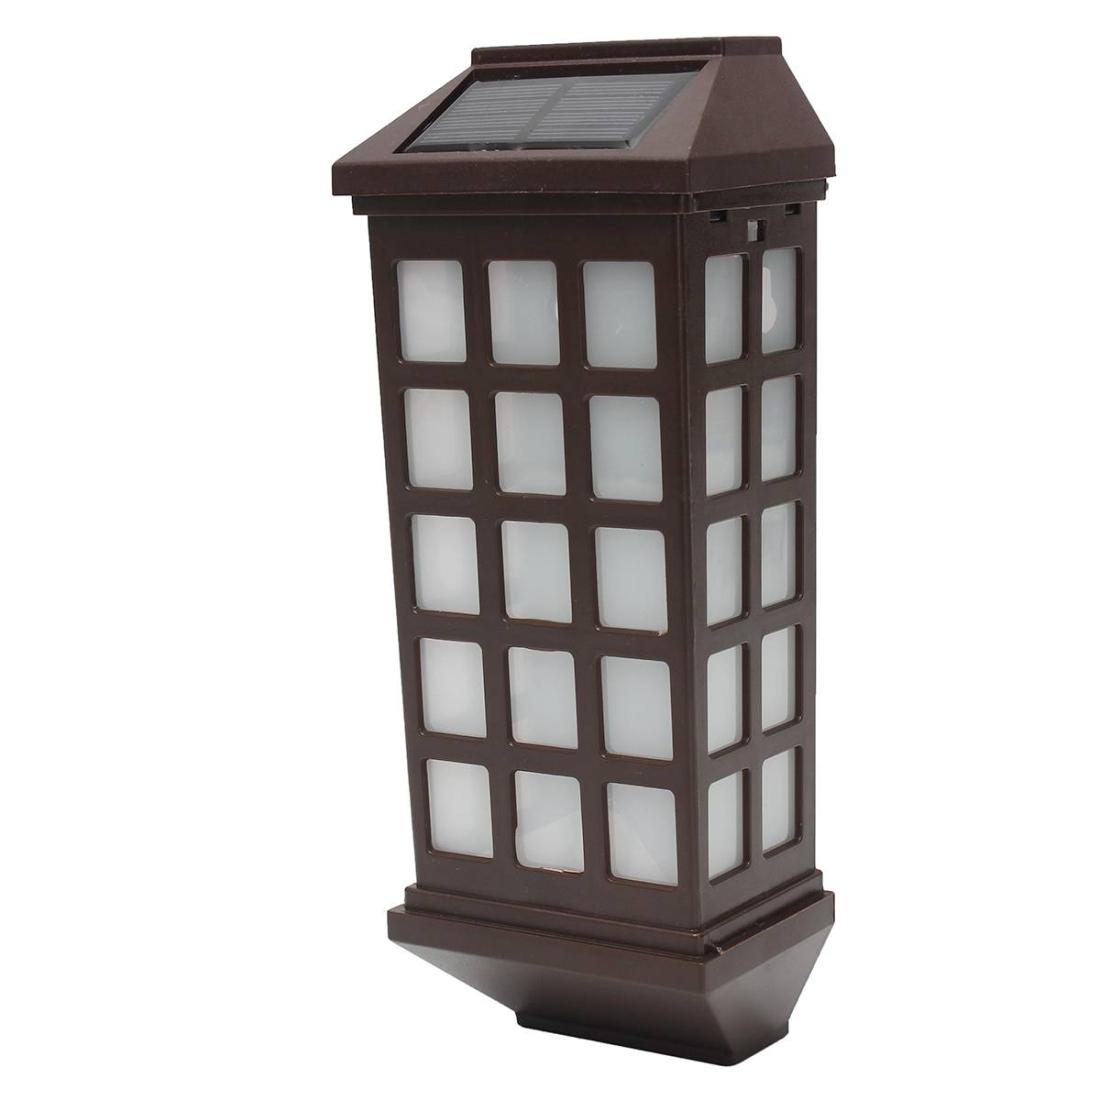 Extended Outdoor Solar Wall Lamp IP65 Waterproof Courtyard Garden Villa Wall Fence Stair Light (Warm White)